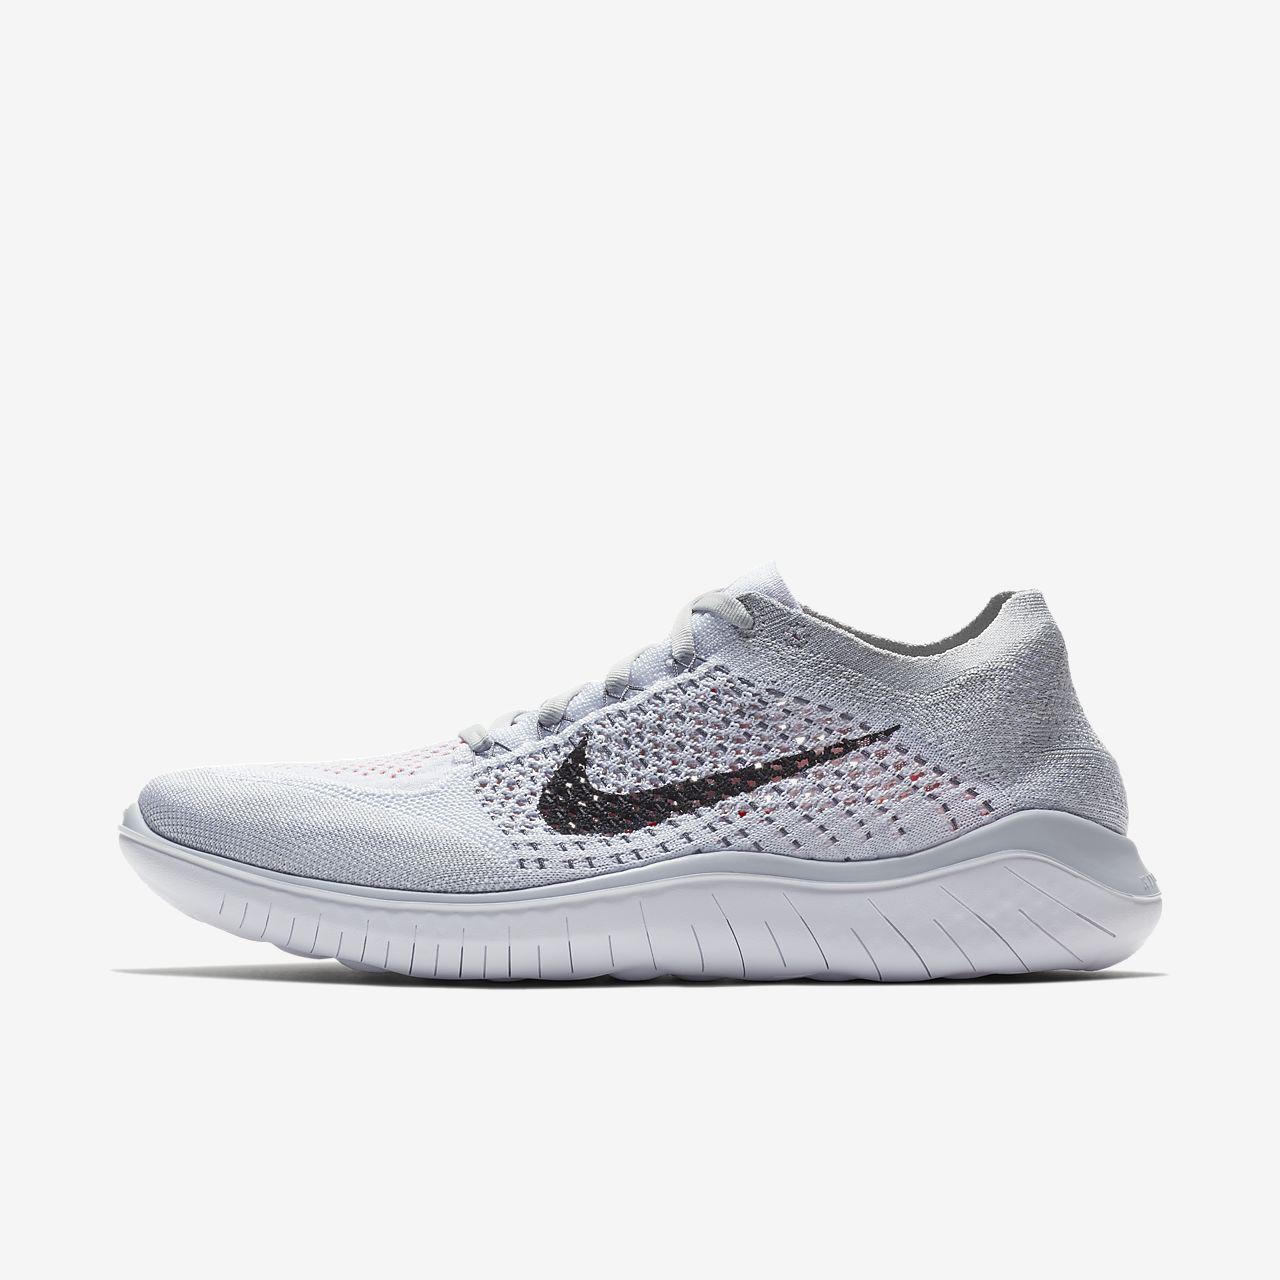 Nike Libre Rn Flyknit 2018 - Chaussures - Bas-tops Et Baskets Nike znnNq